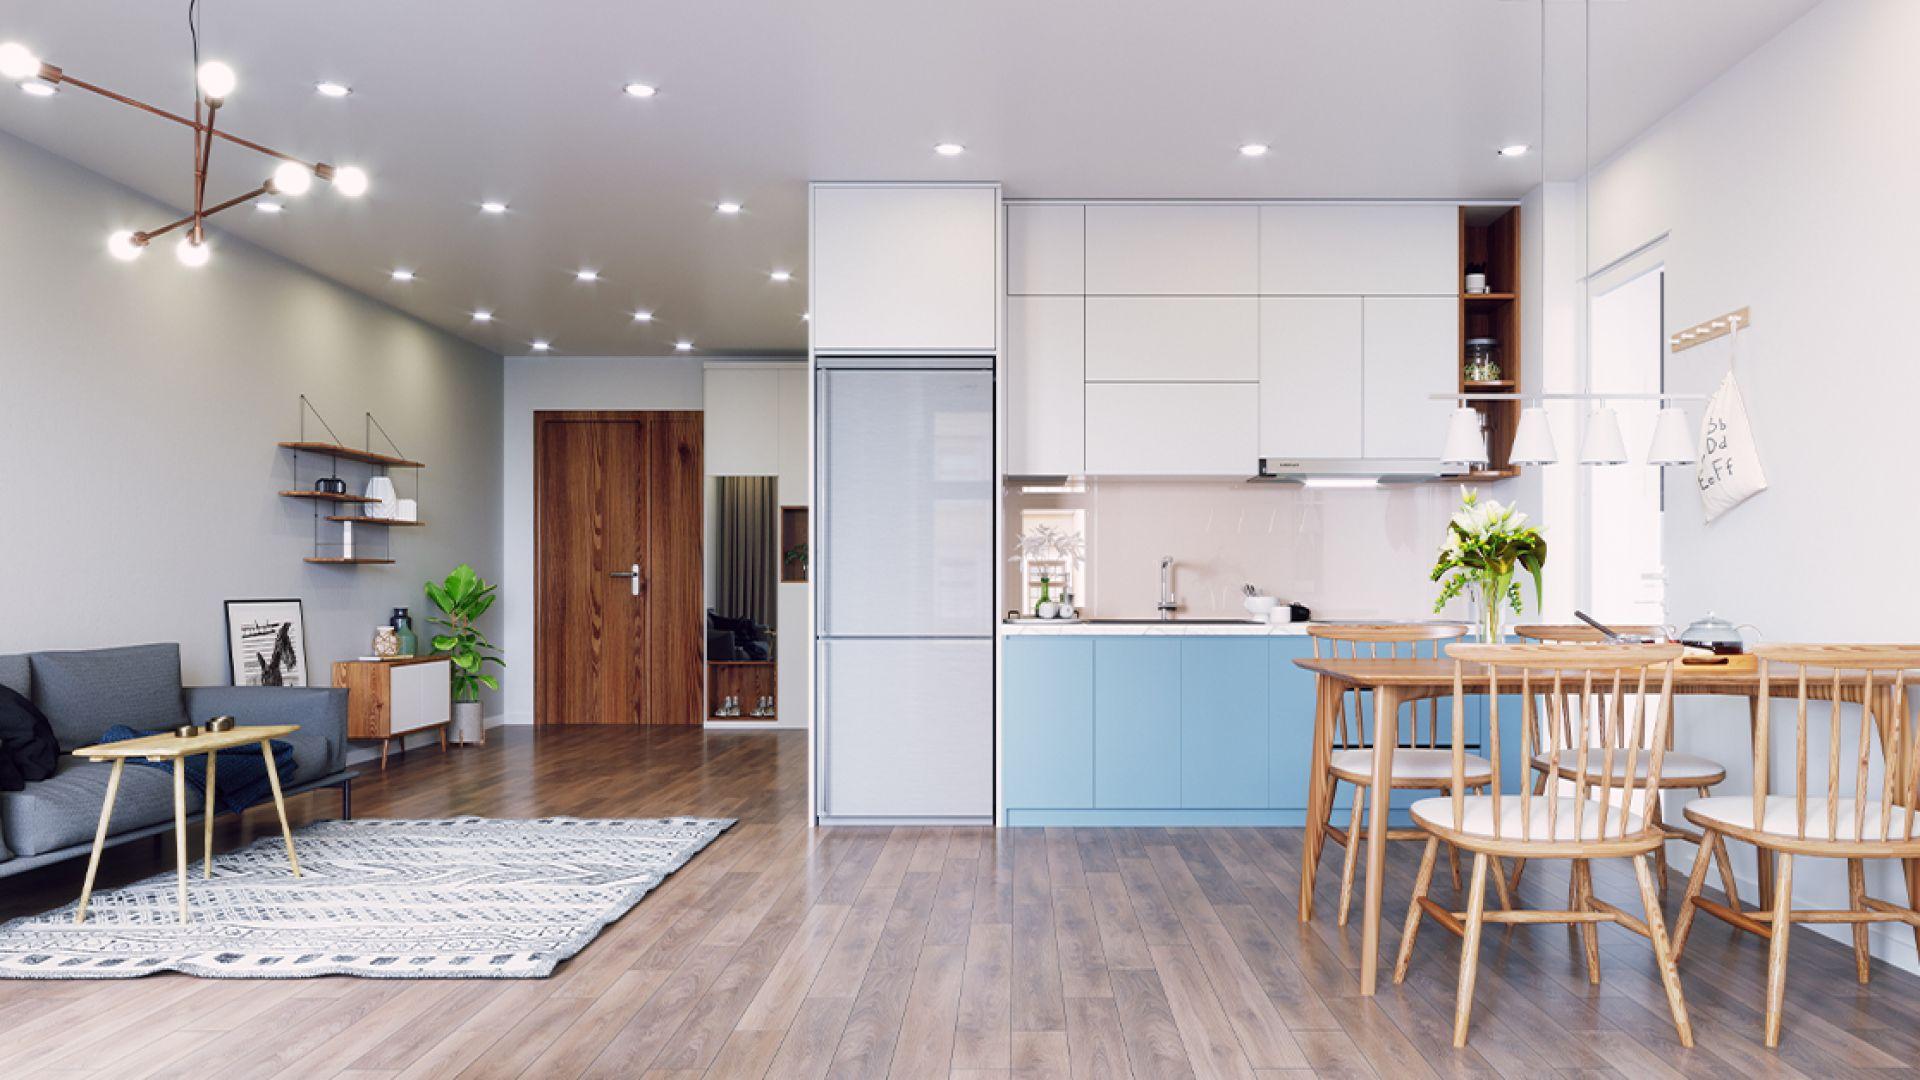 Как да обзаведем малък апартамент?